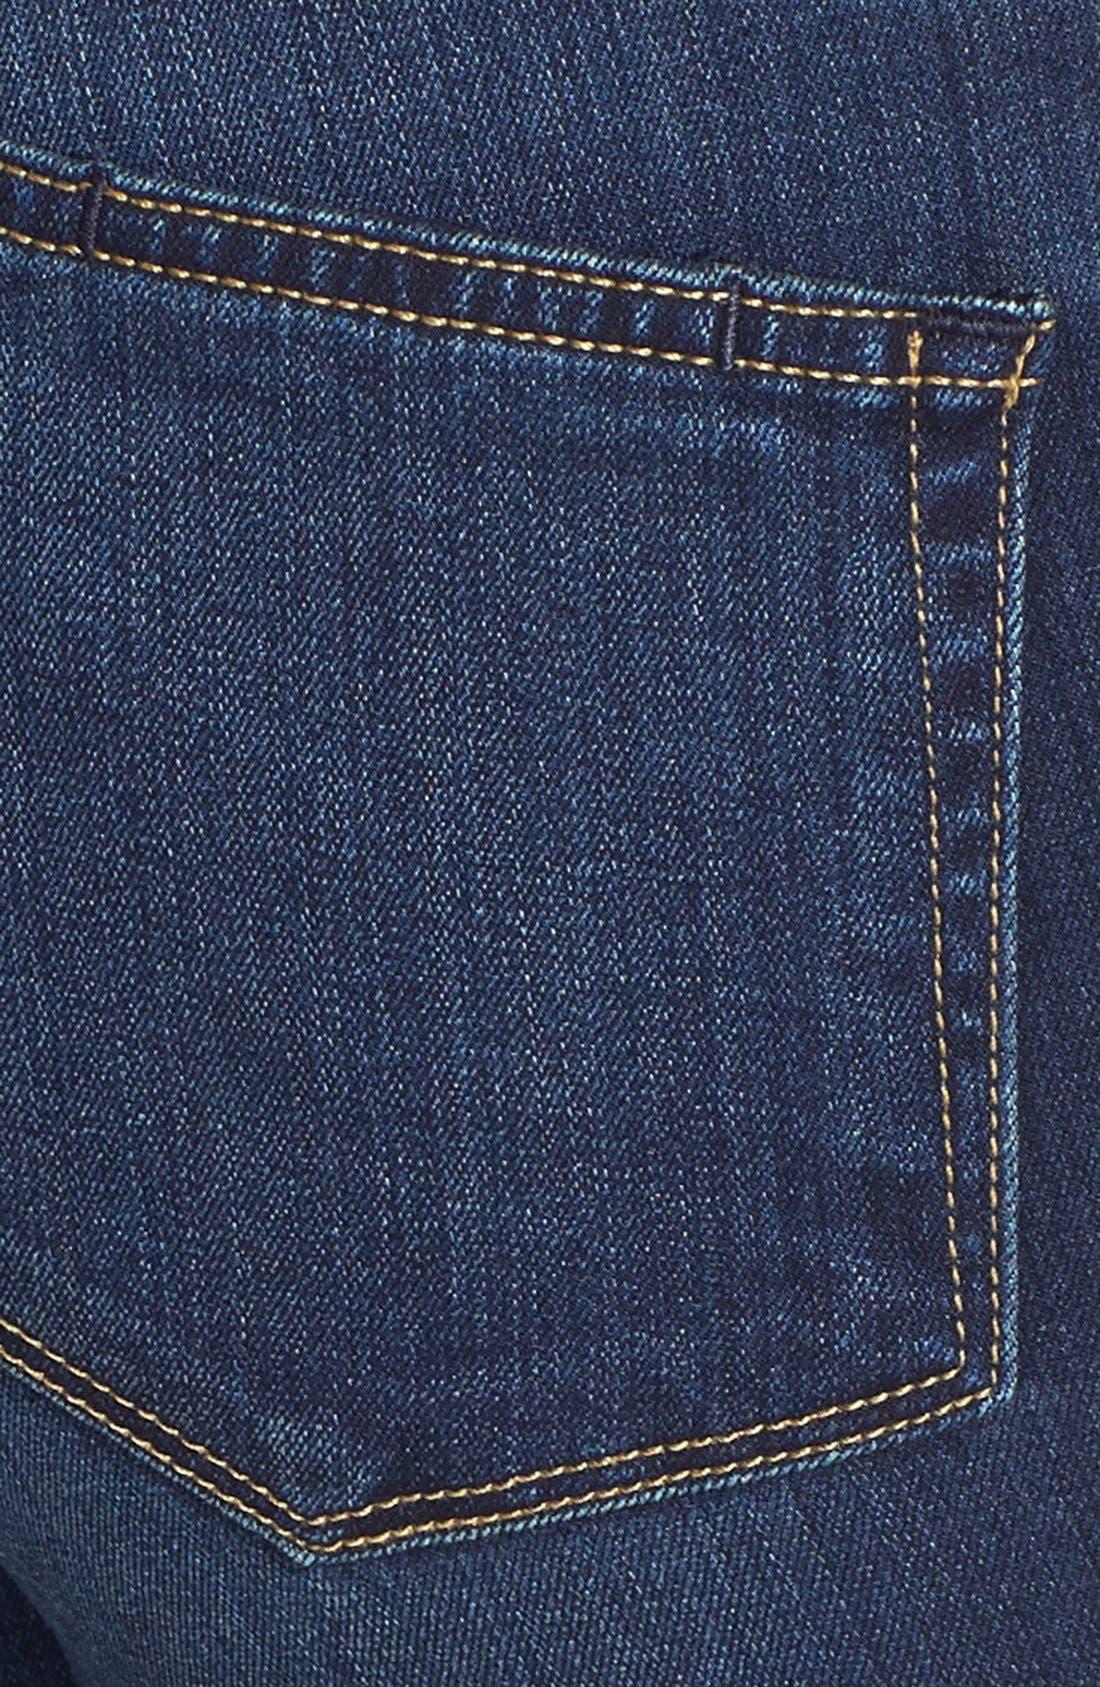 'Transcend - Bell Canyon' High Rise Flare Jeans,                             Alternate thumbnail 3, color,                             Nottingham